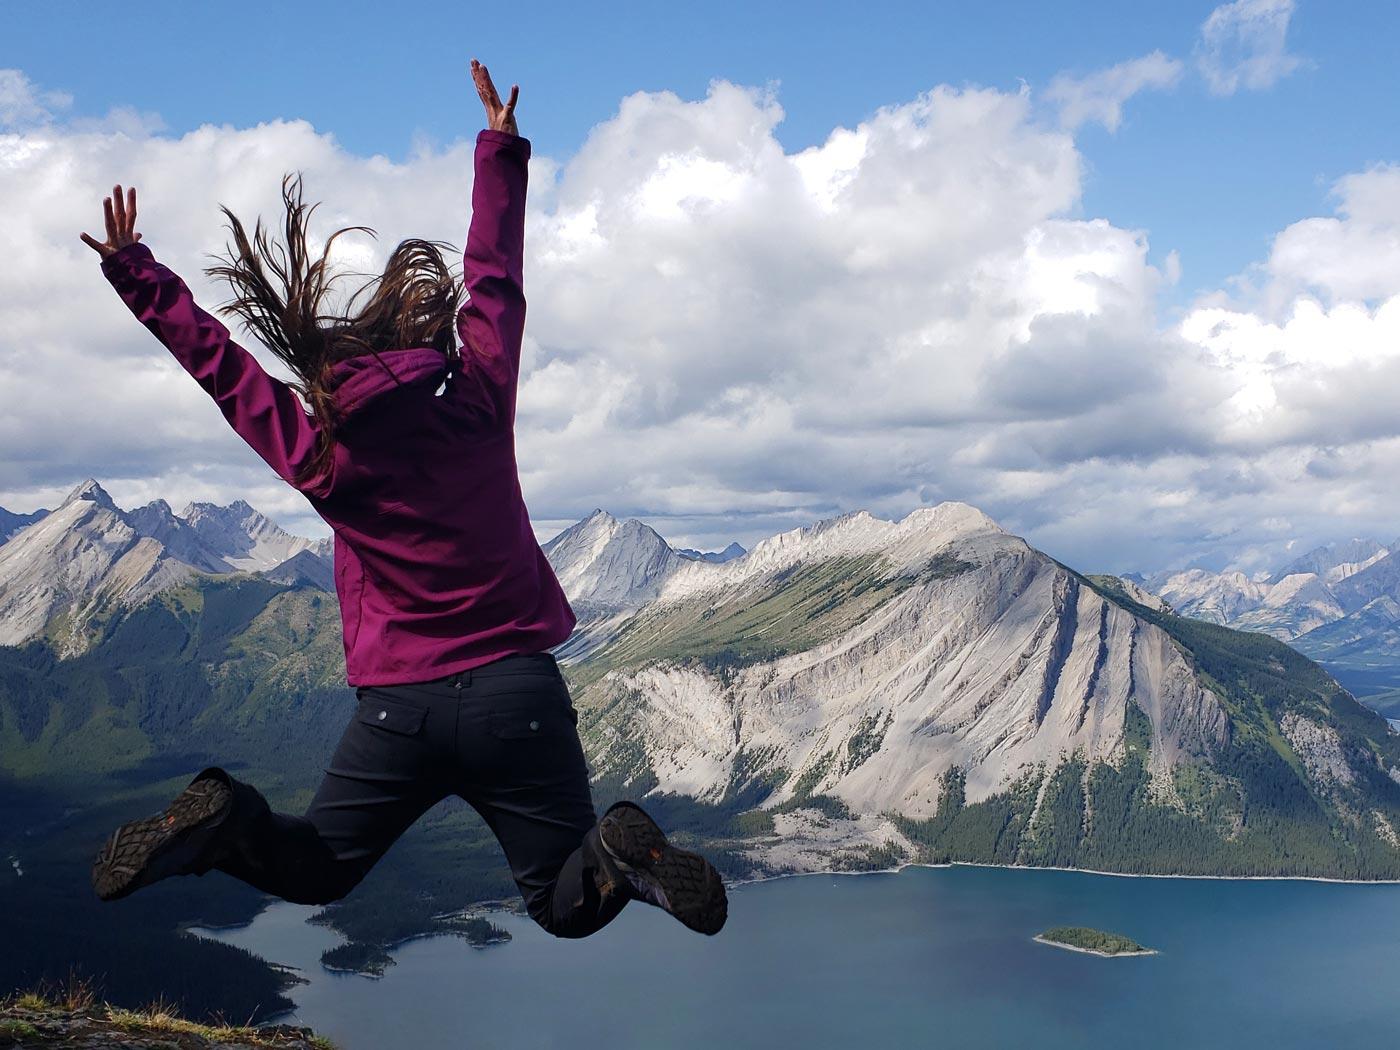 Jolene Rempel jumping on Sarrail Ridge in Kananaskis Country, Alberta, Canada.